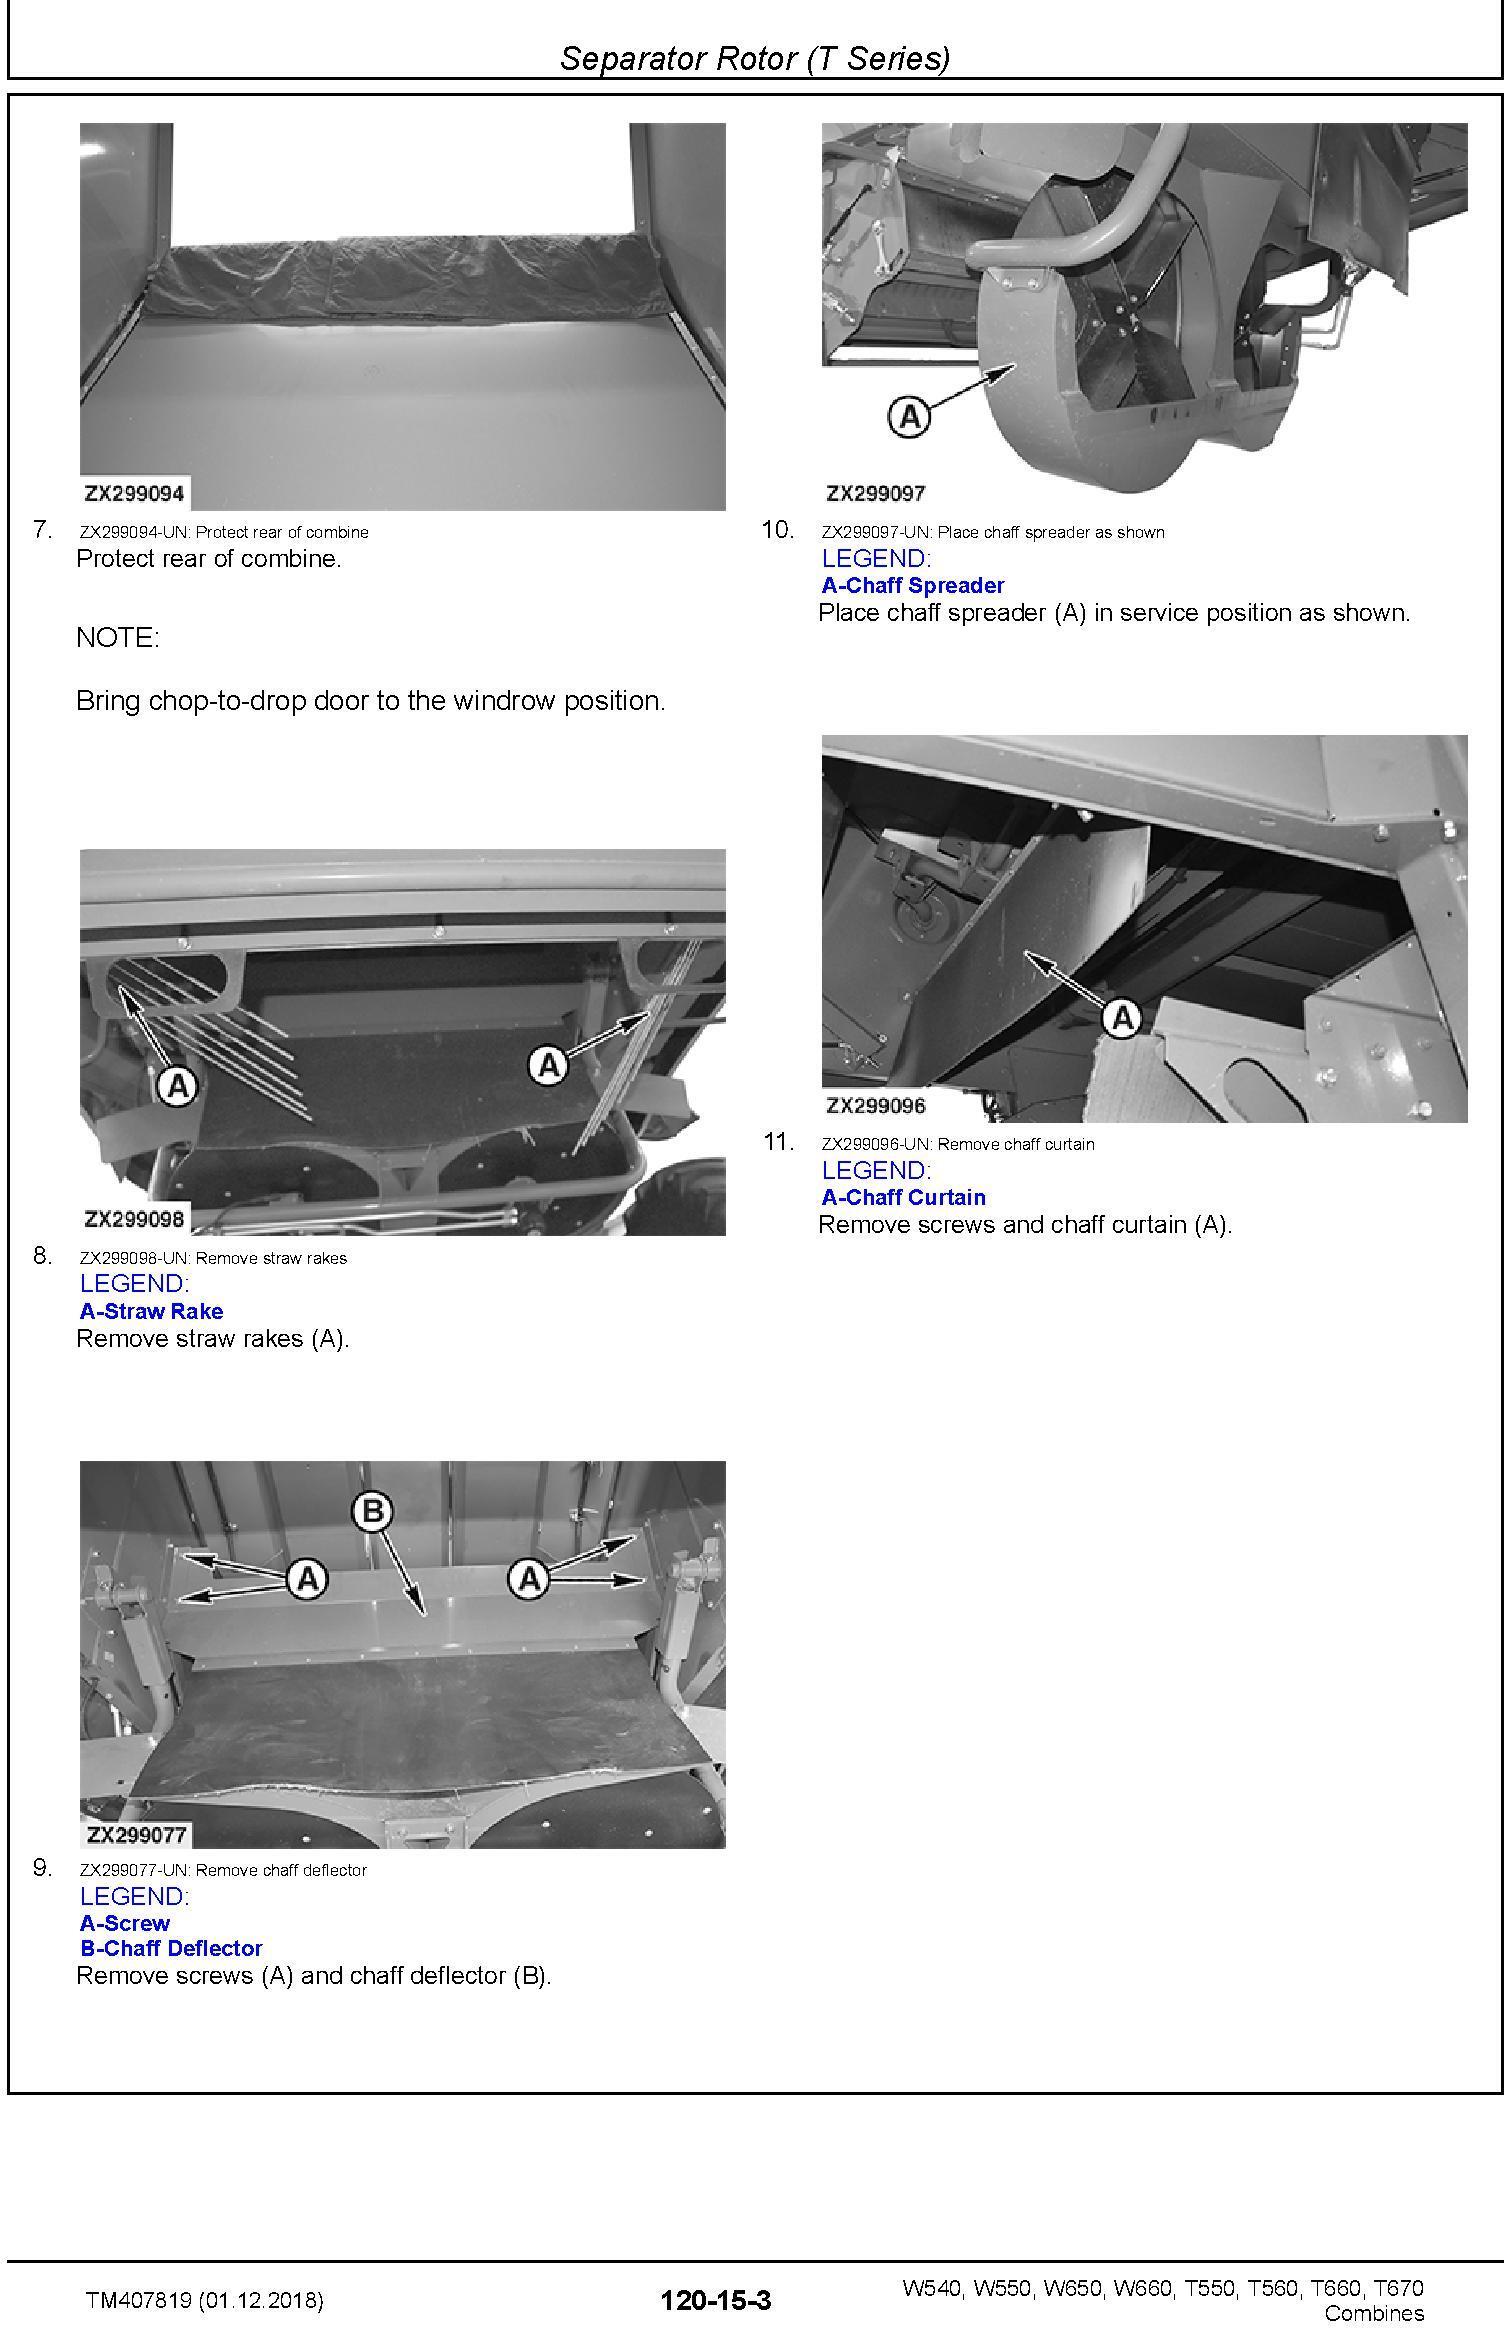 John Deere W540, W550, W650, W660, T550, T560, T660, T670 Combine Repair Technical Manual (TM407819) - 1